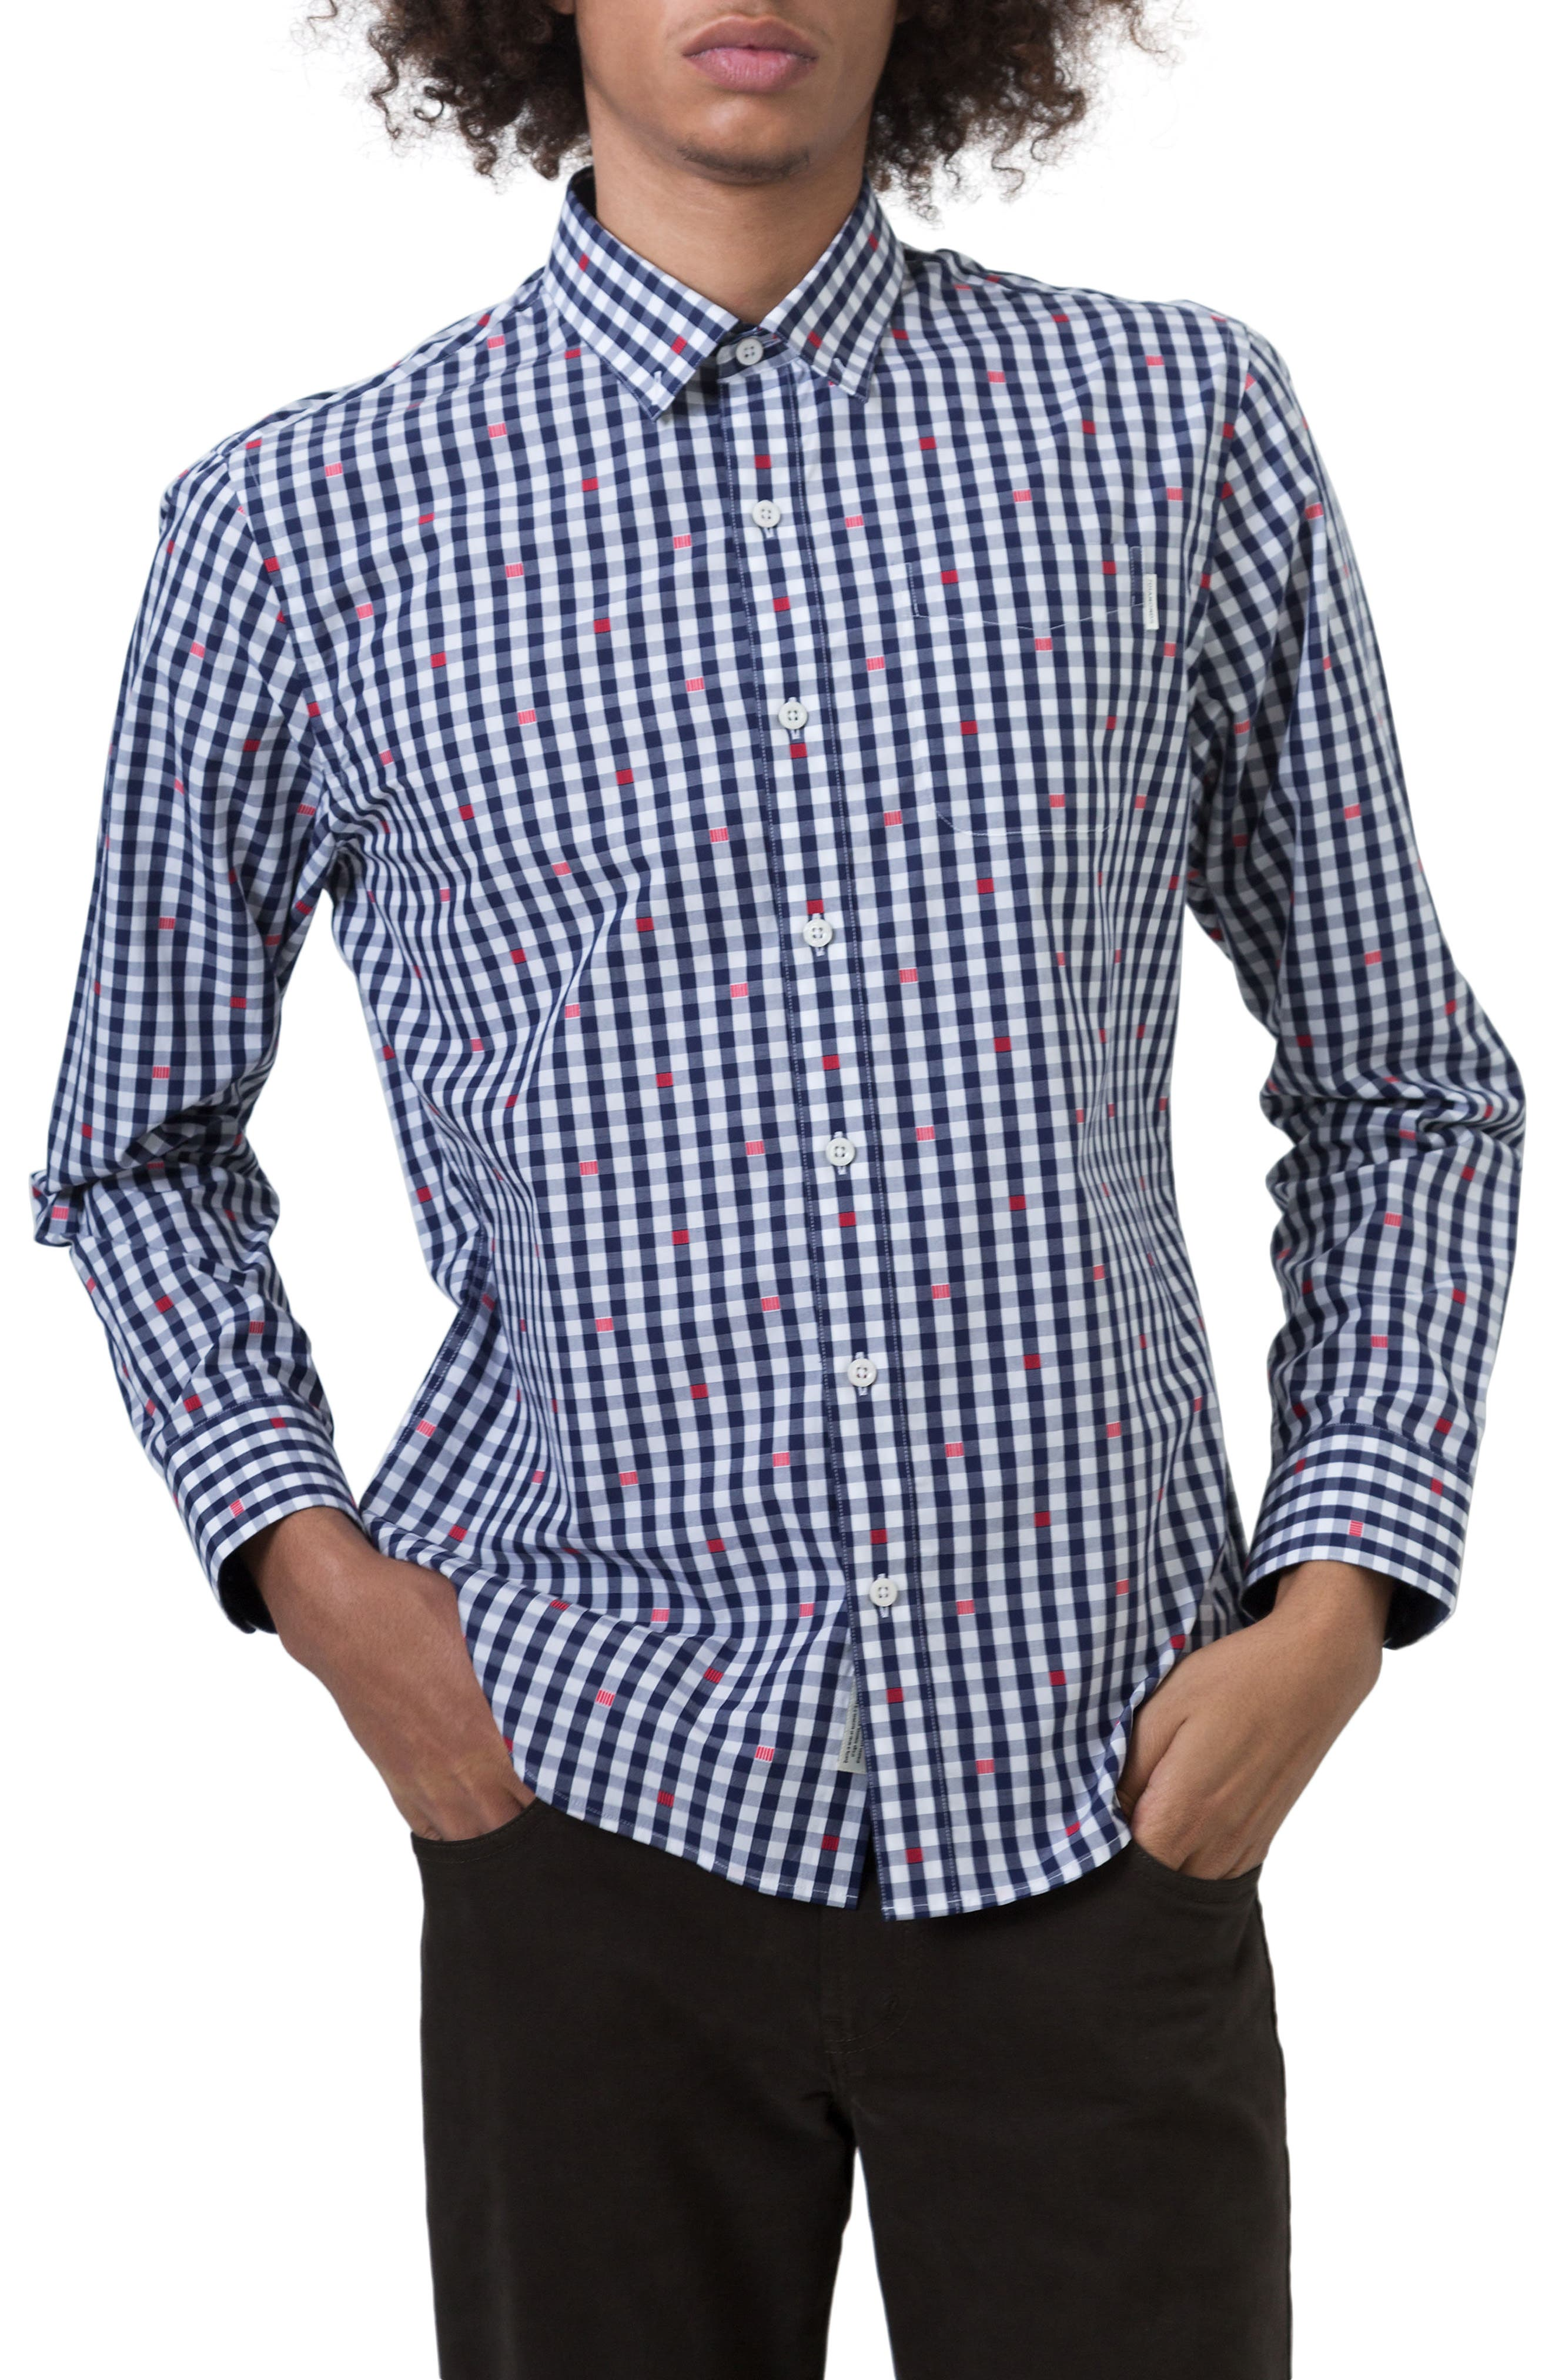 Petrichor Woven Shirt,                             Main thumbnail 1, color,                             410